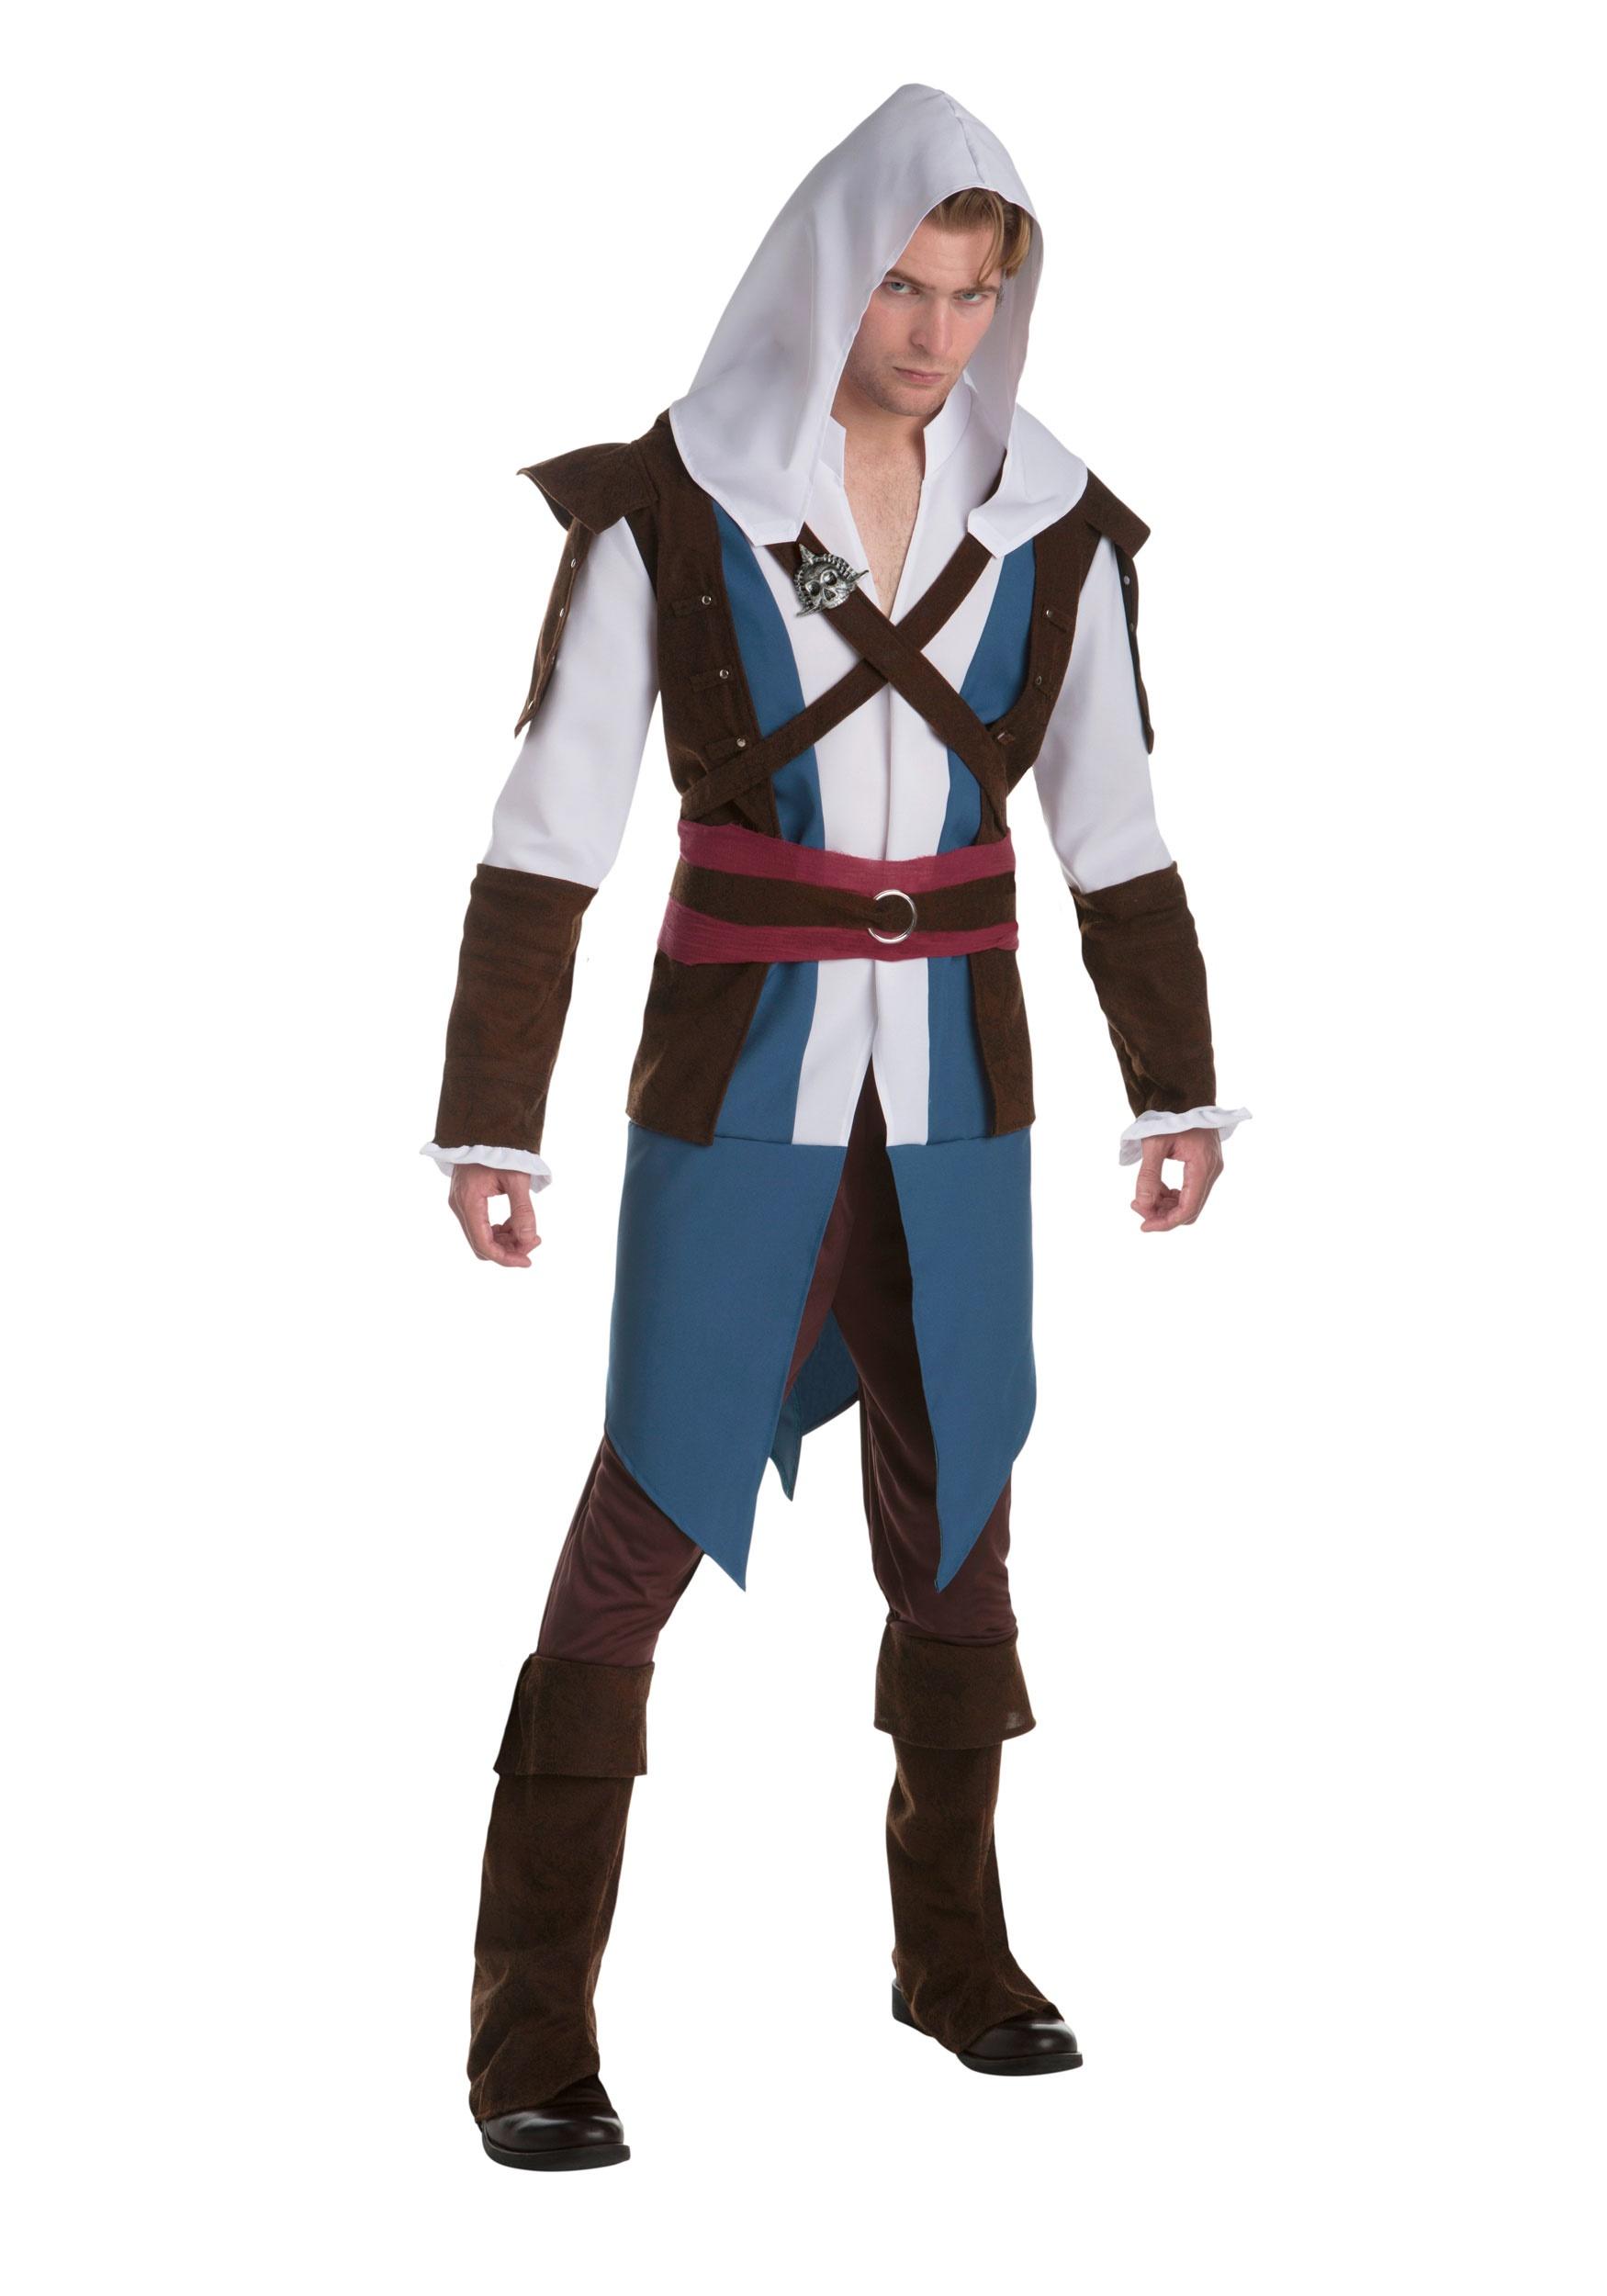 Assassins Creed Edward Kenway Fancy Dress Costume for Men